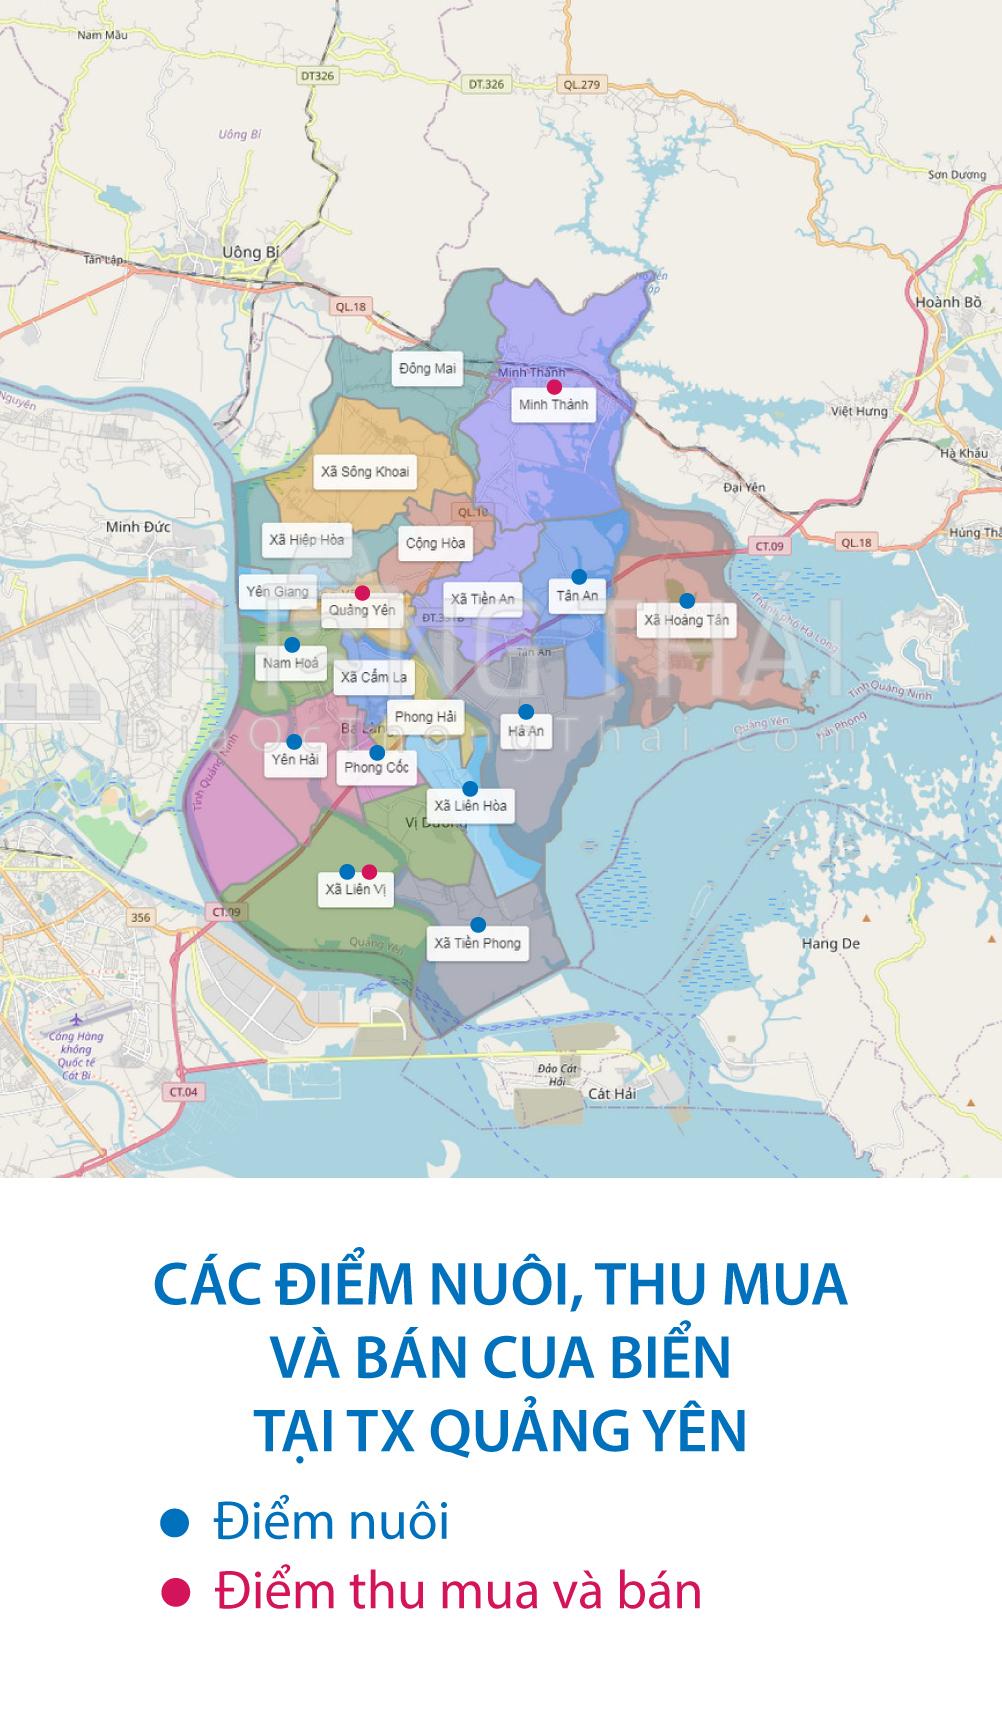 bản đồ cua quảng ninh